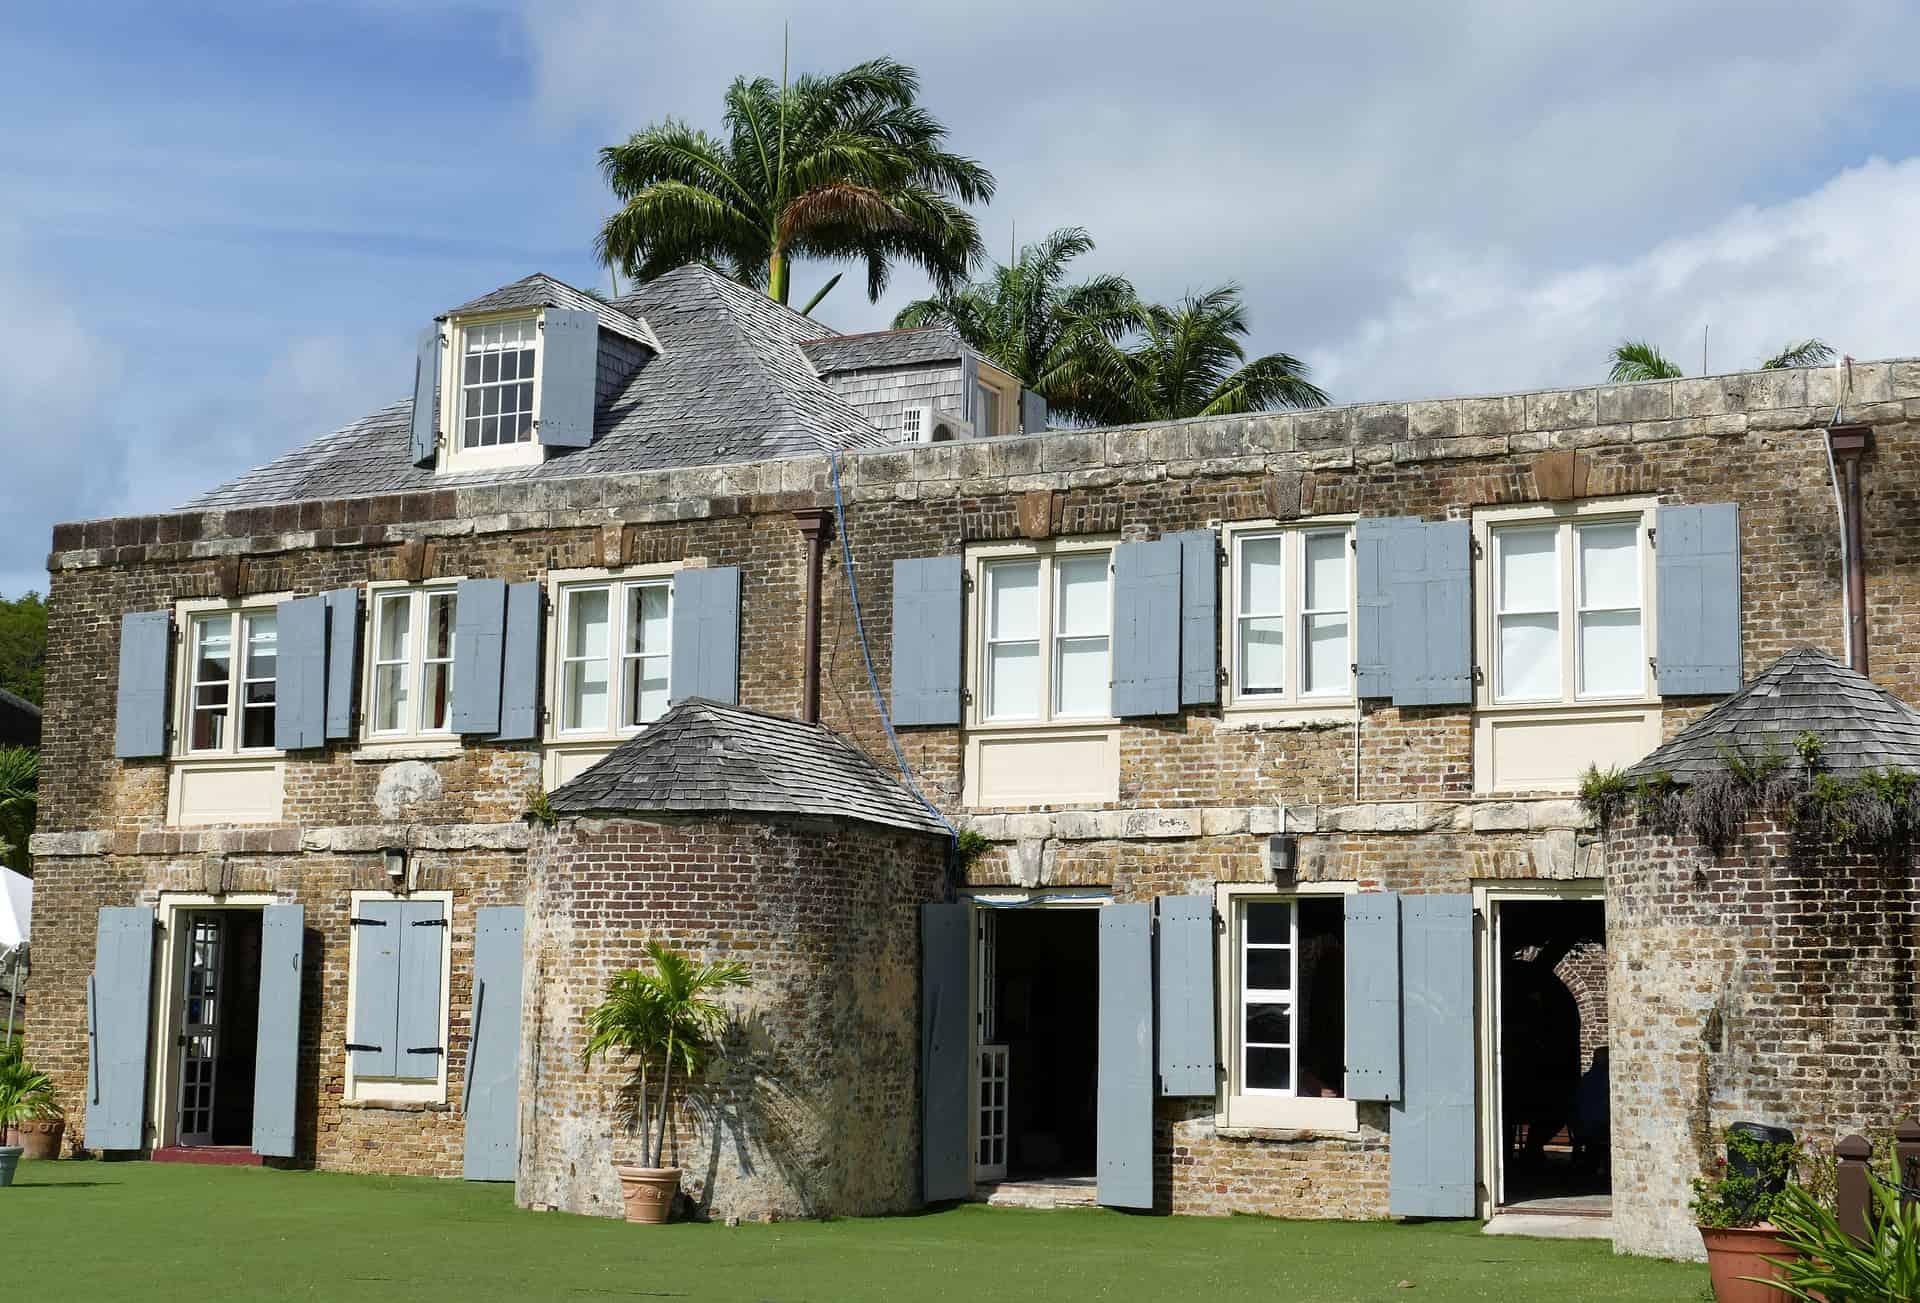 St John's, Antigua House